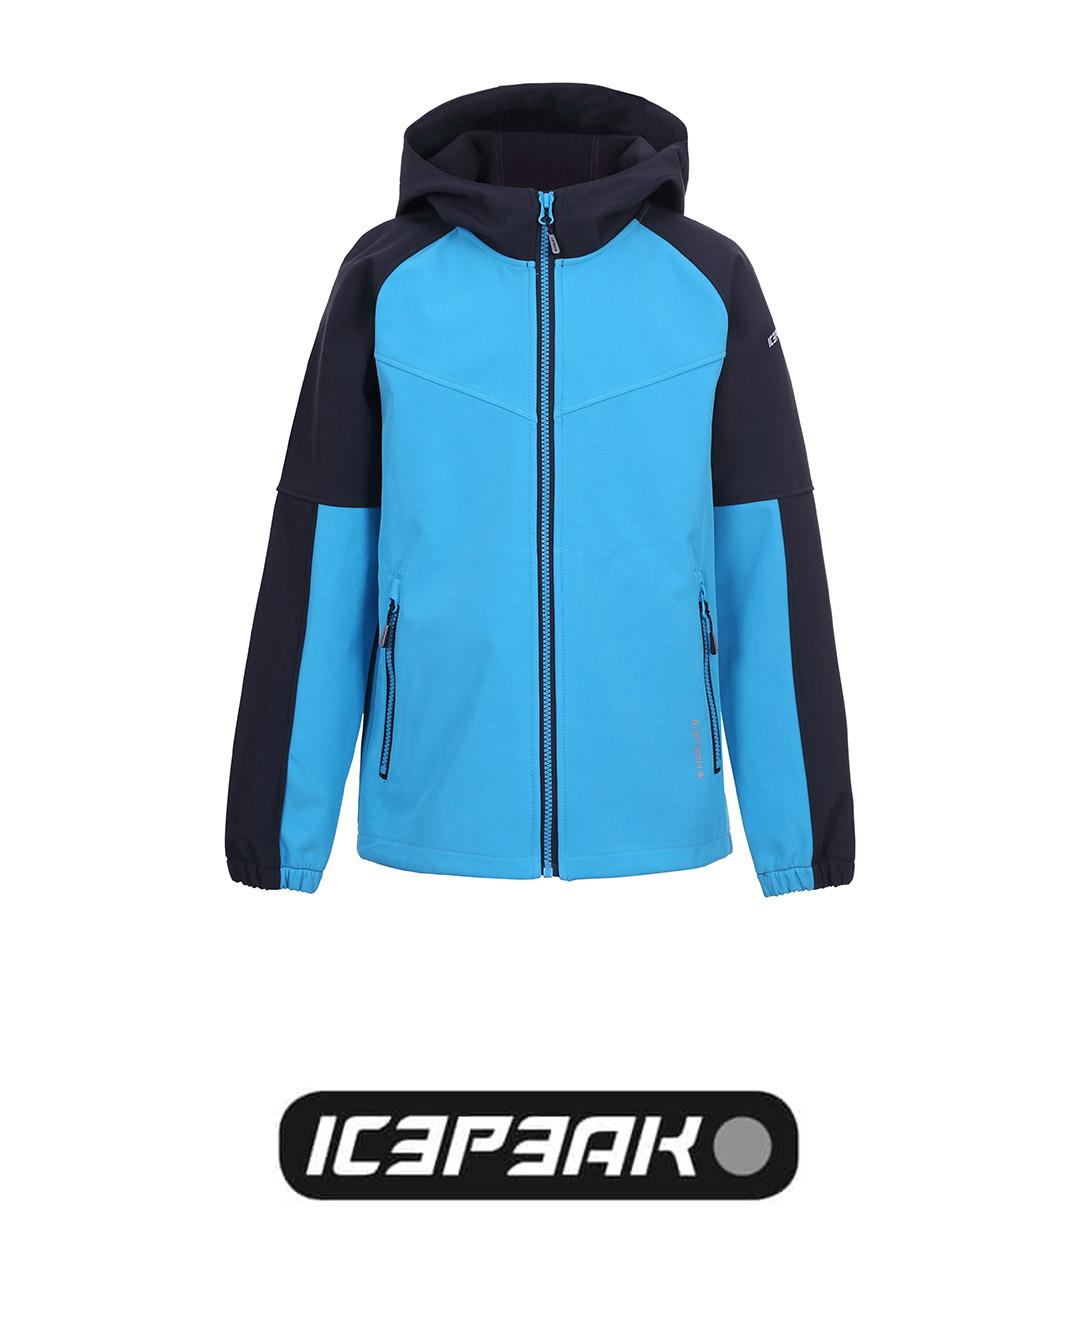 Icepeak Outlet Softshell Jacke